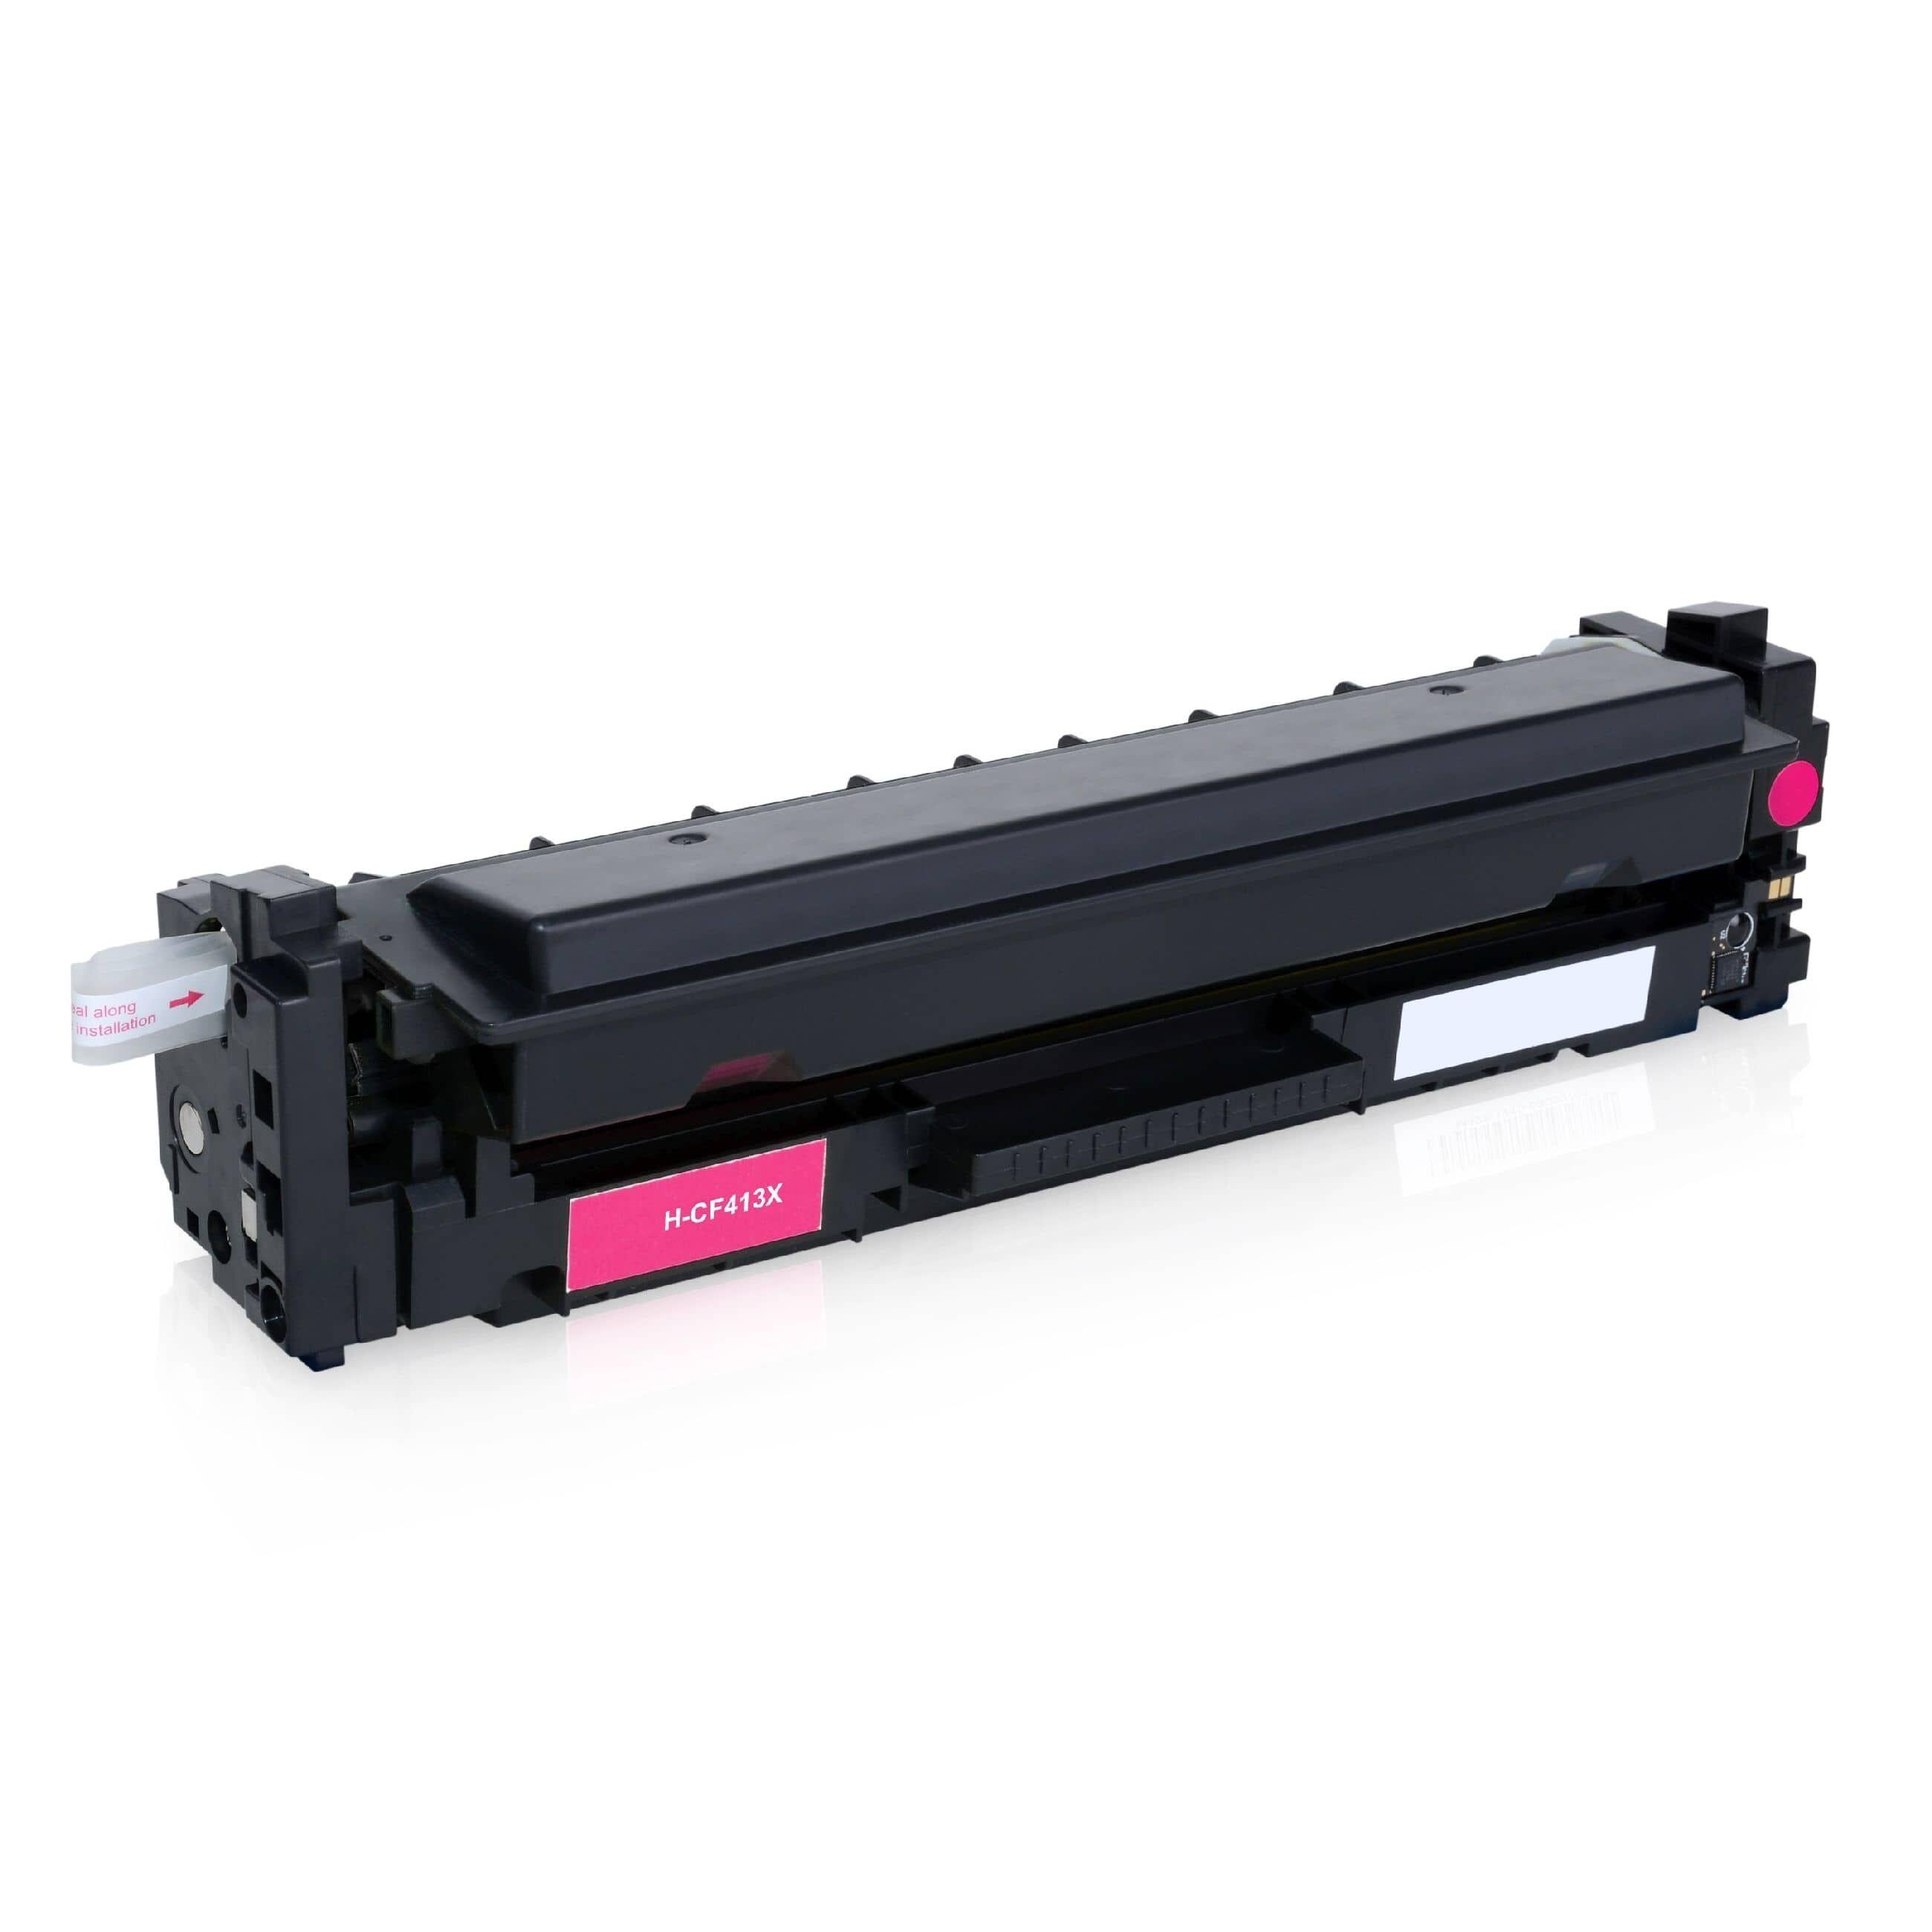 HP Cartouche de Toner pour HP CF413X / 410X magenta compatible (de marque ASC)